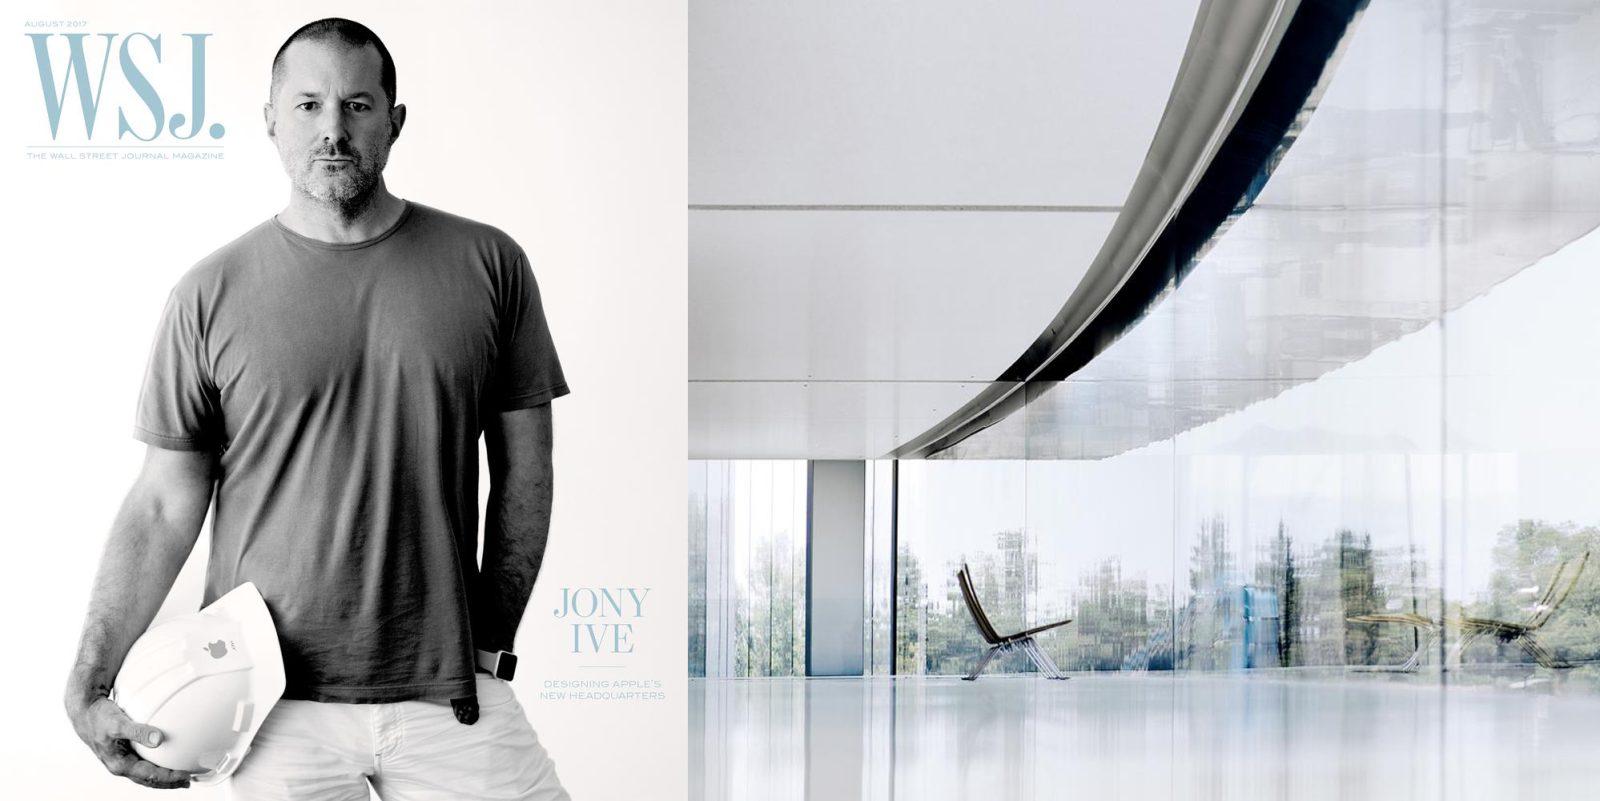 Entrevista de Jony Ive sobre el Apple Park